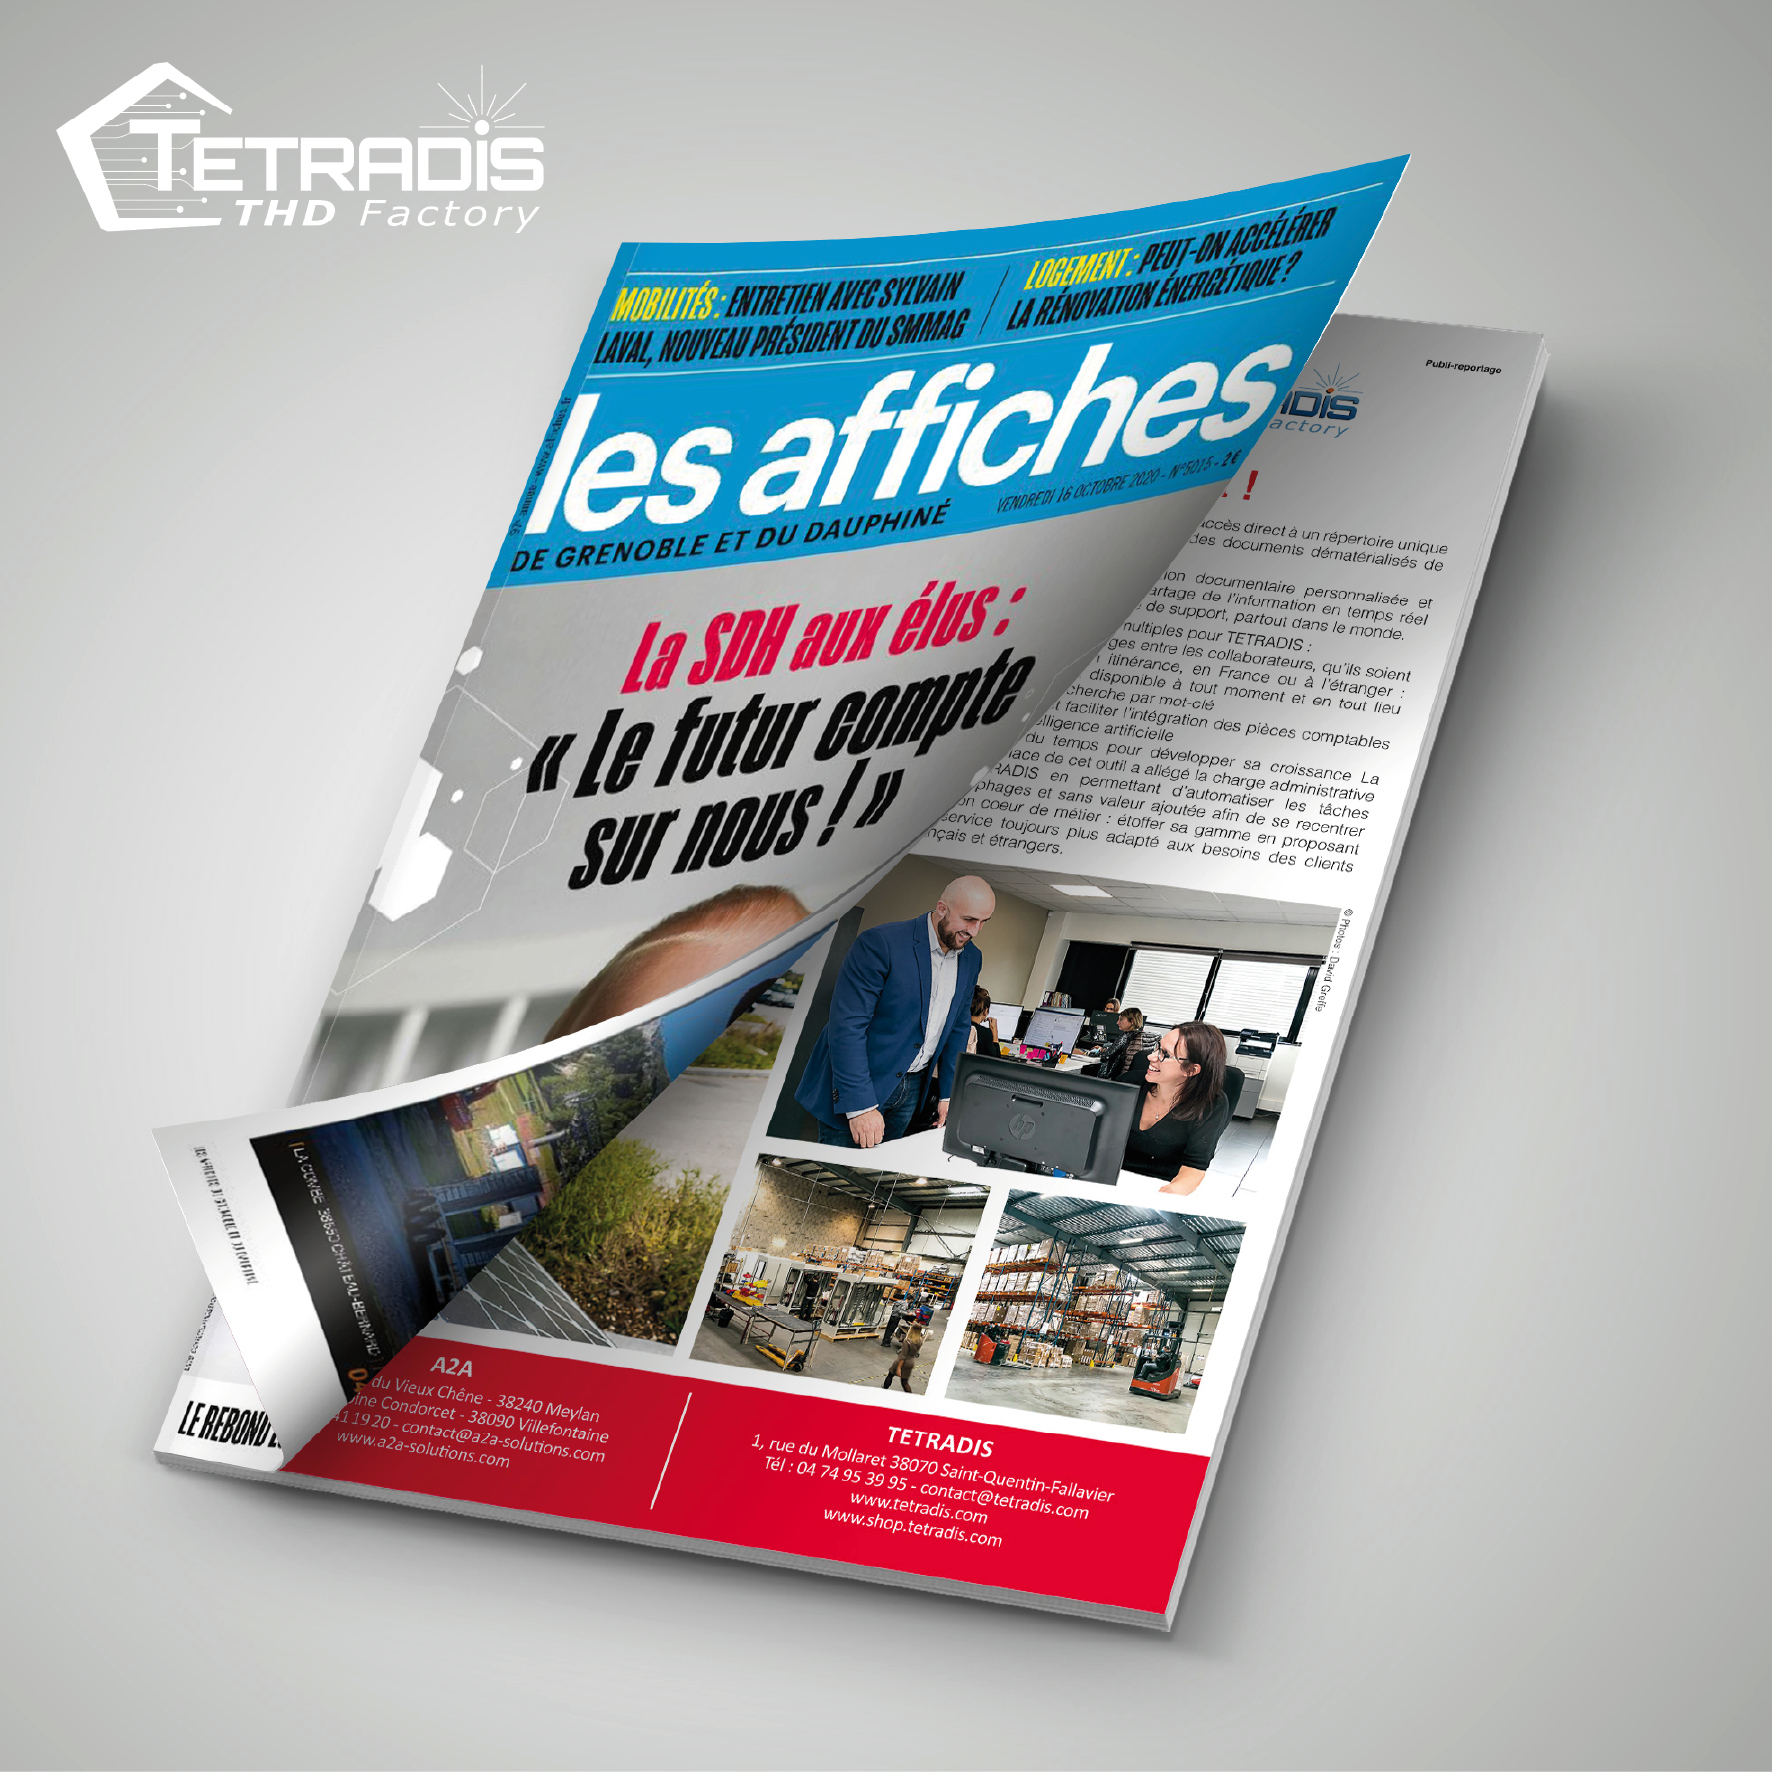 A2A / TETRADIS : Un partenariat de confiance mis à l'honneur dans la presse